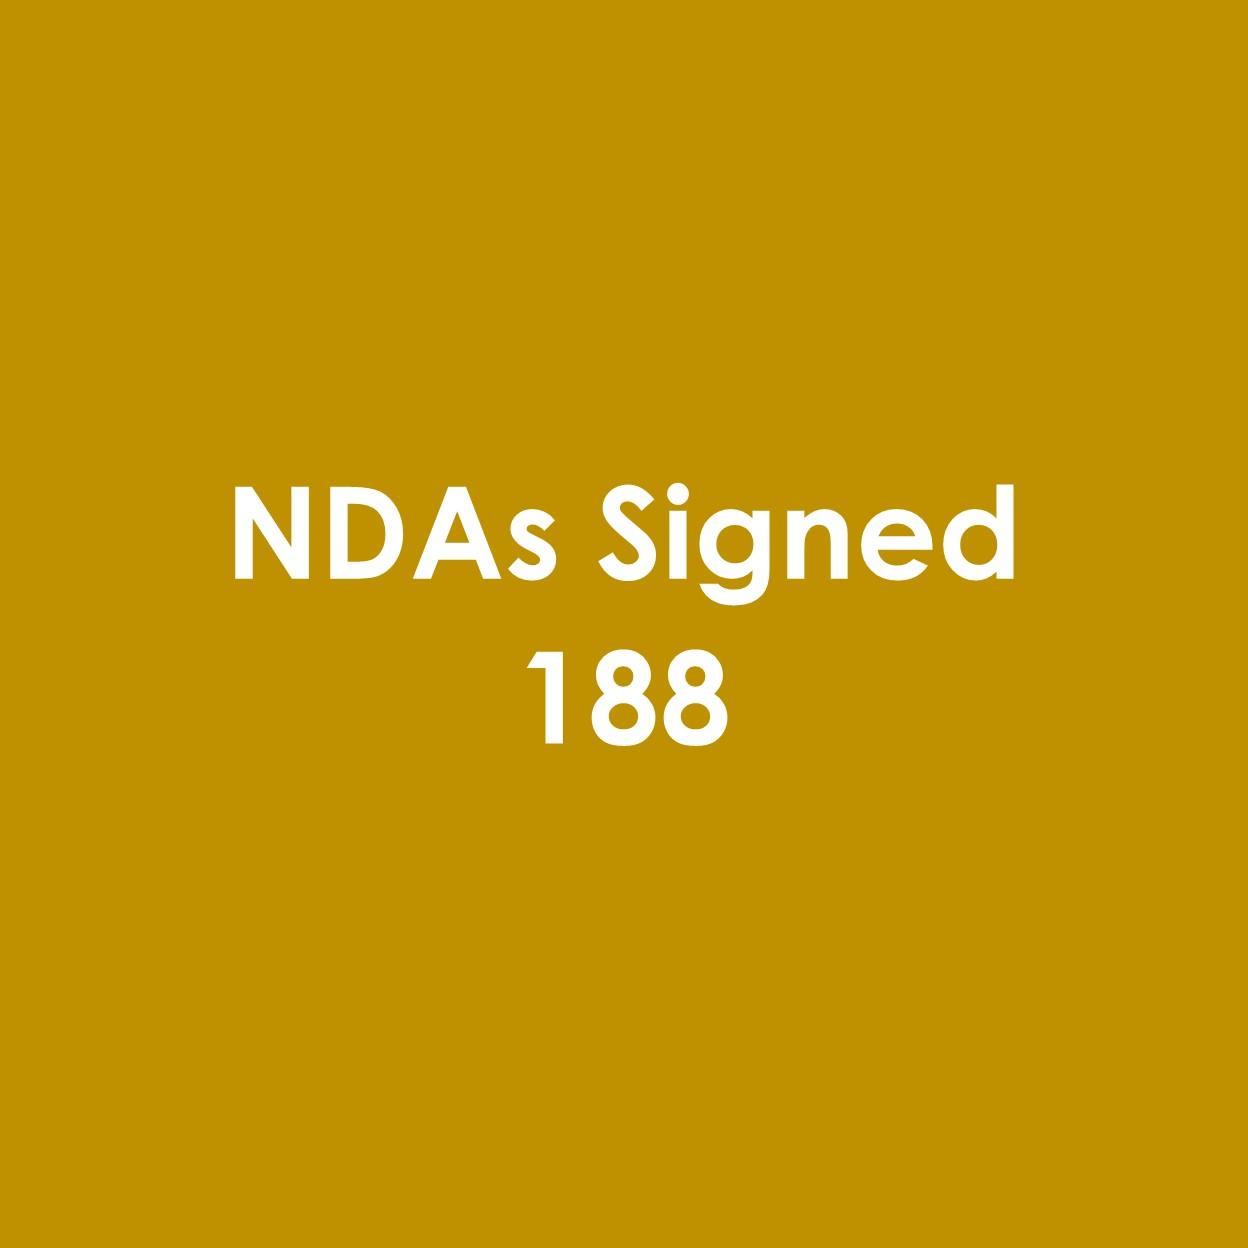 The Wynn Group's NDAs Signed